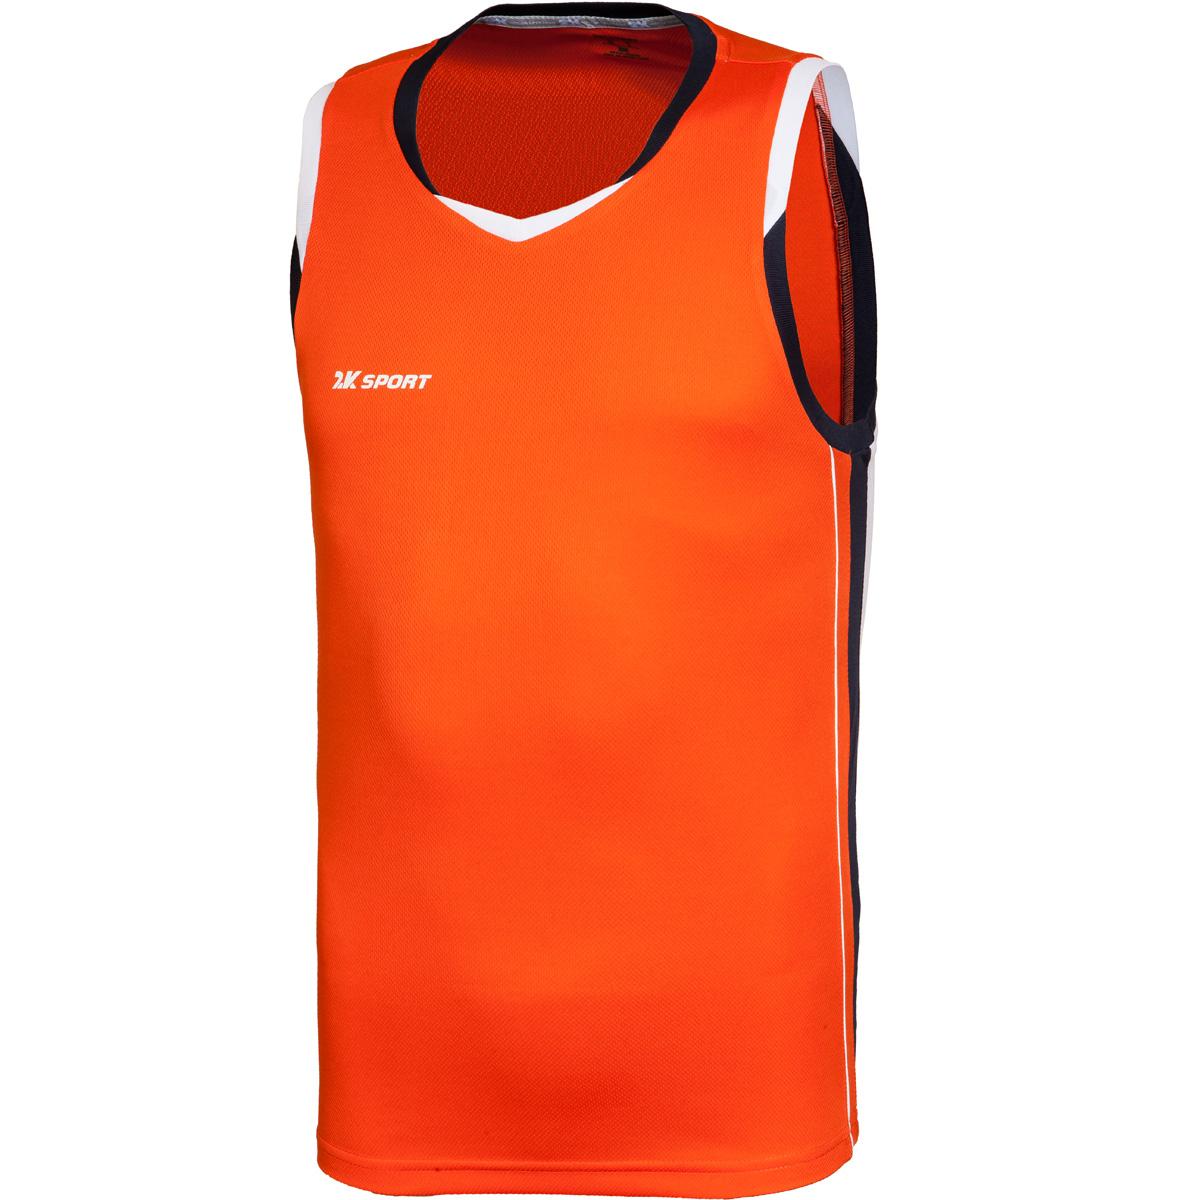 Майка баскетбольная мужская 2K Sport Advance, цвет: оранжевый, темно-синий, белый. 130030. Размер XXL (54) - Баскетбол